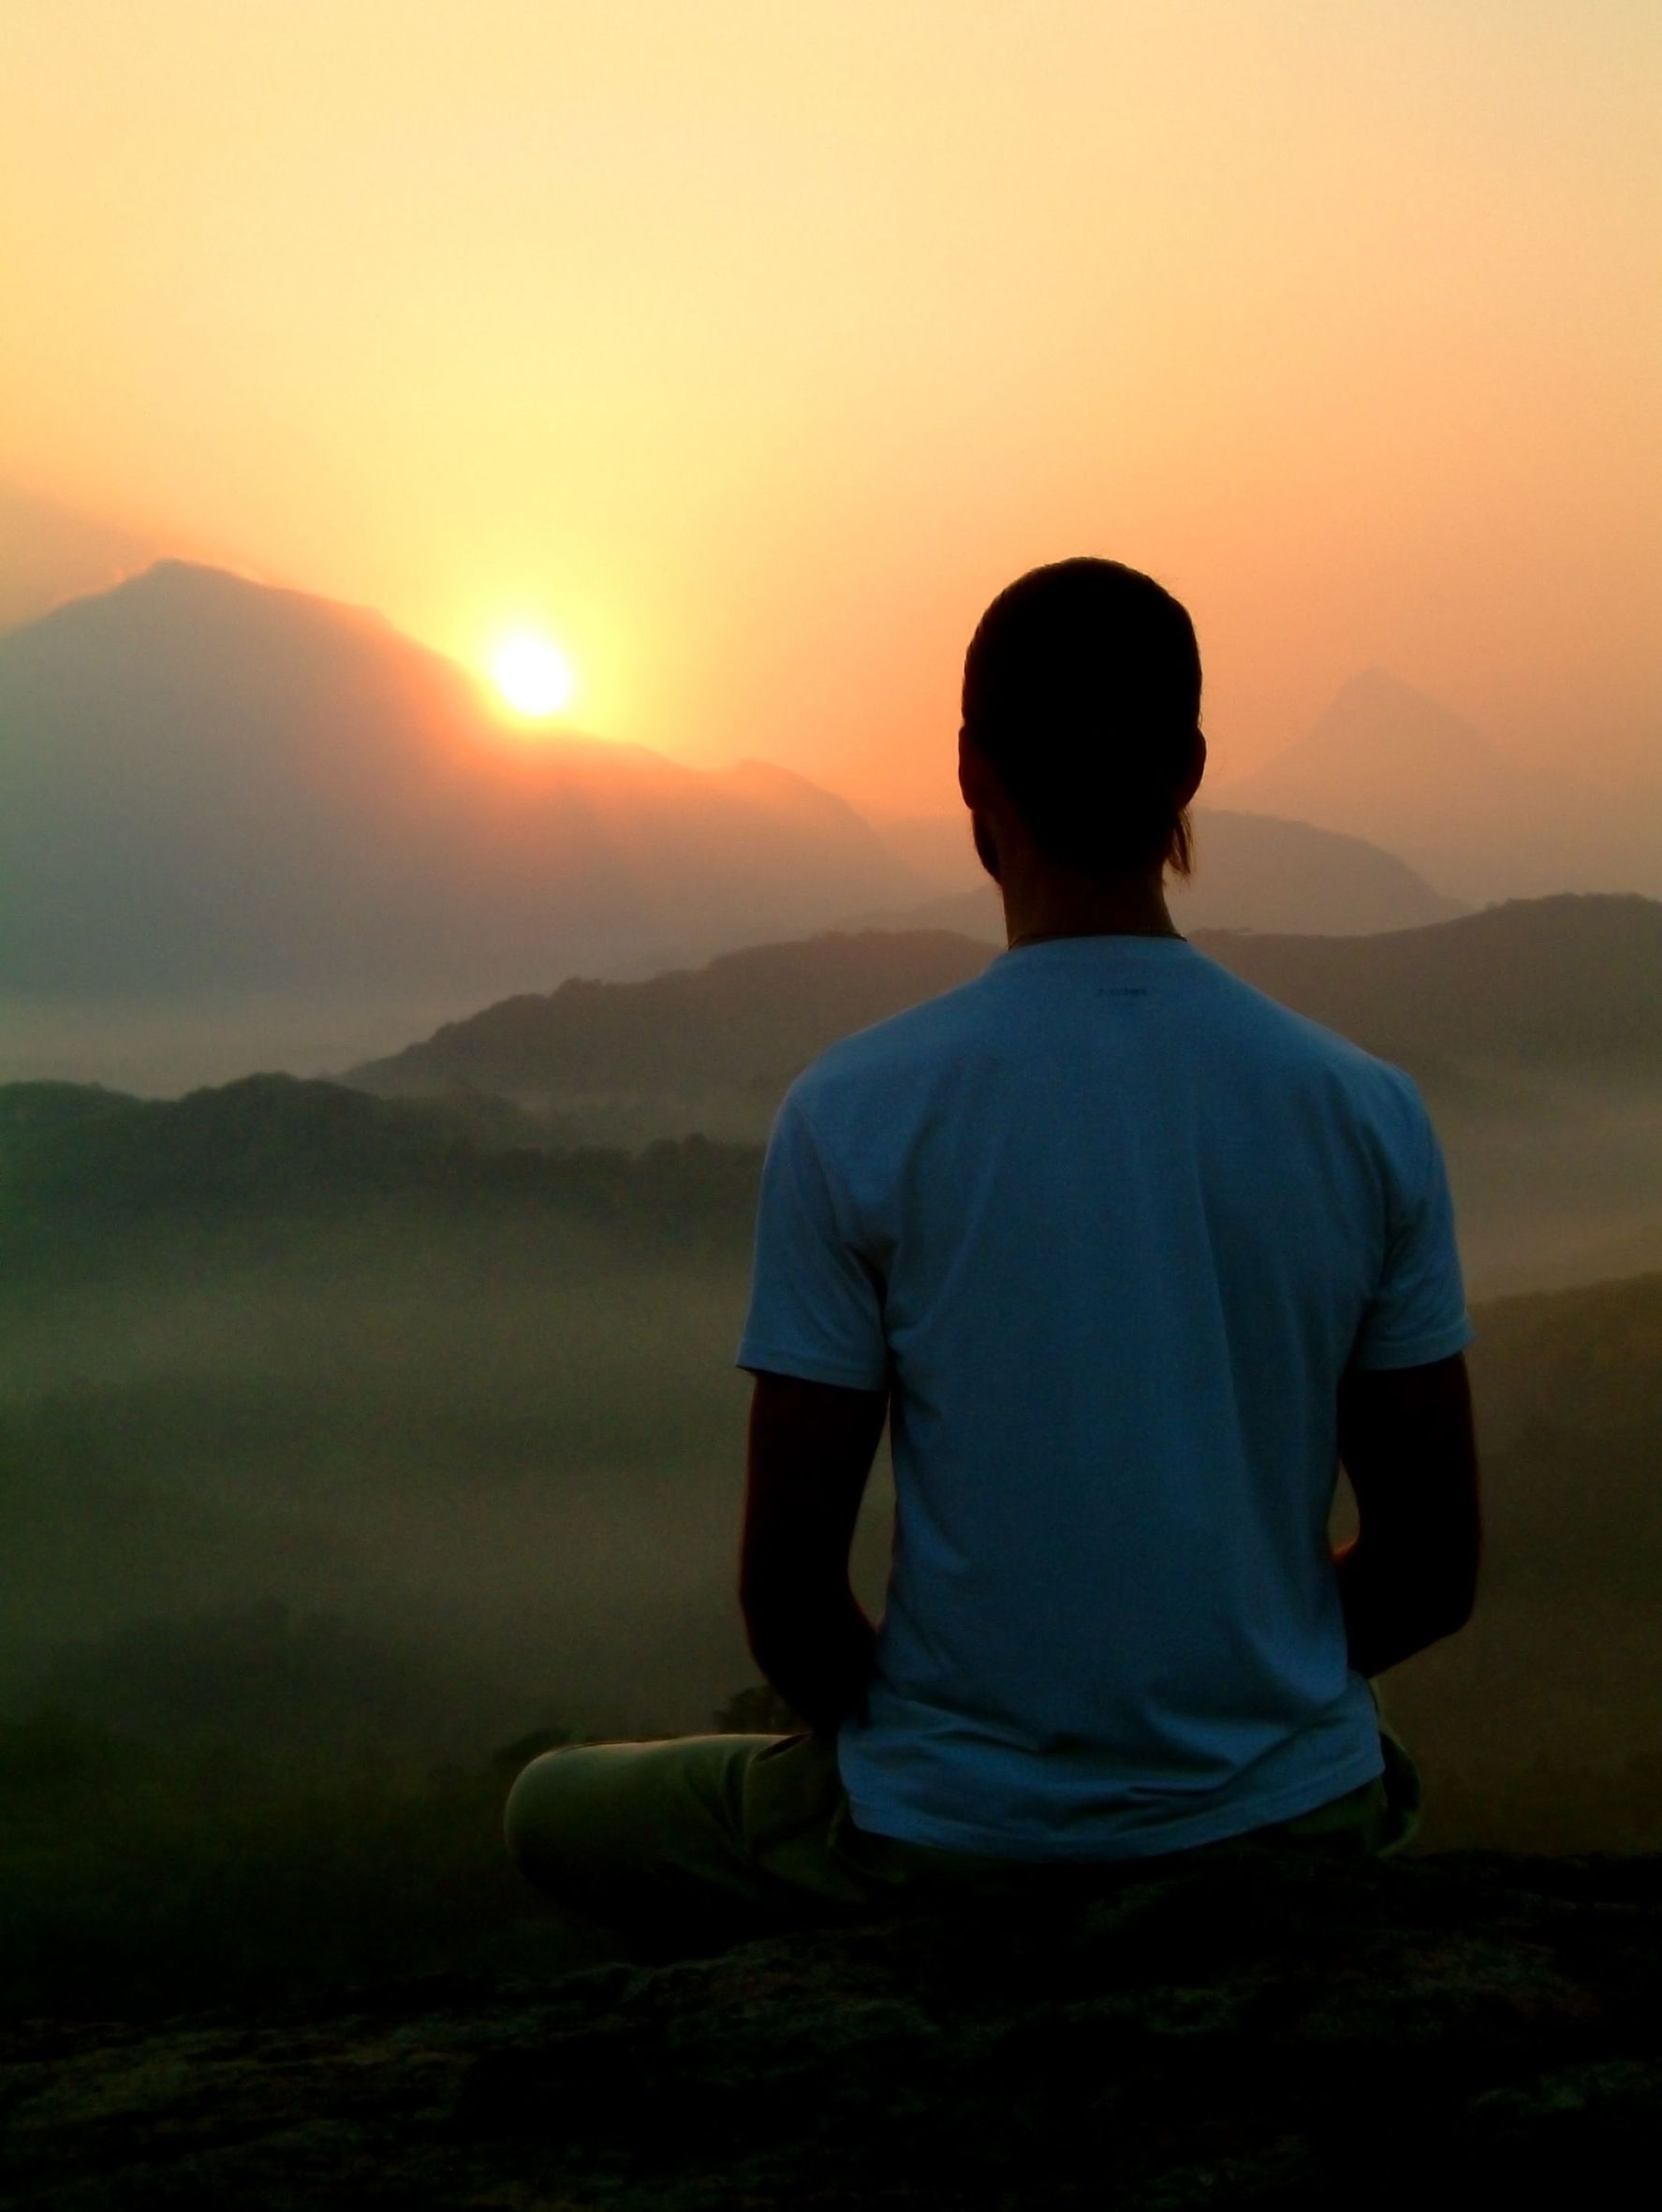 meditator at sunset